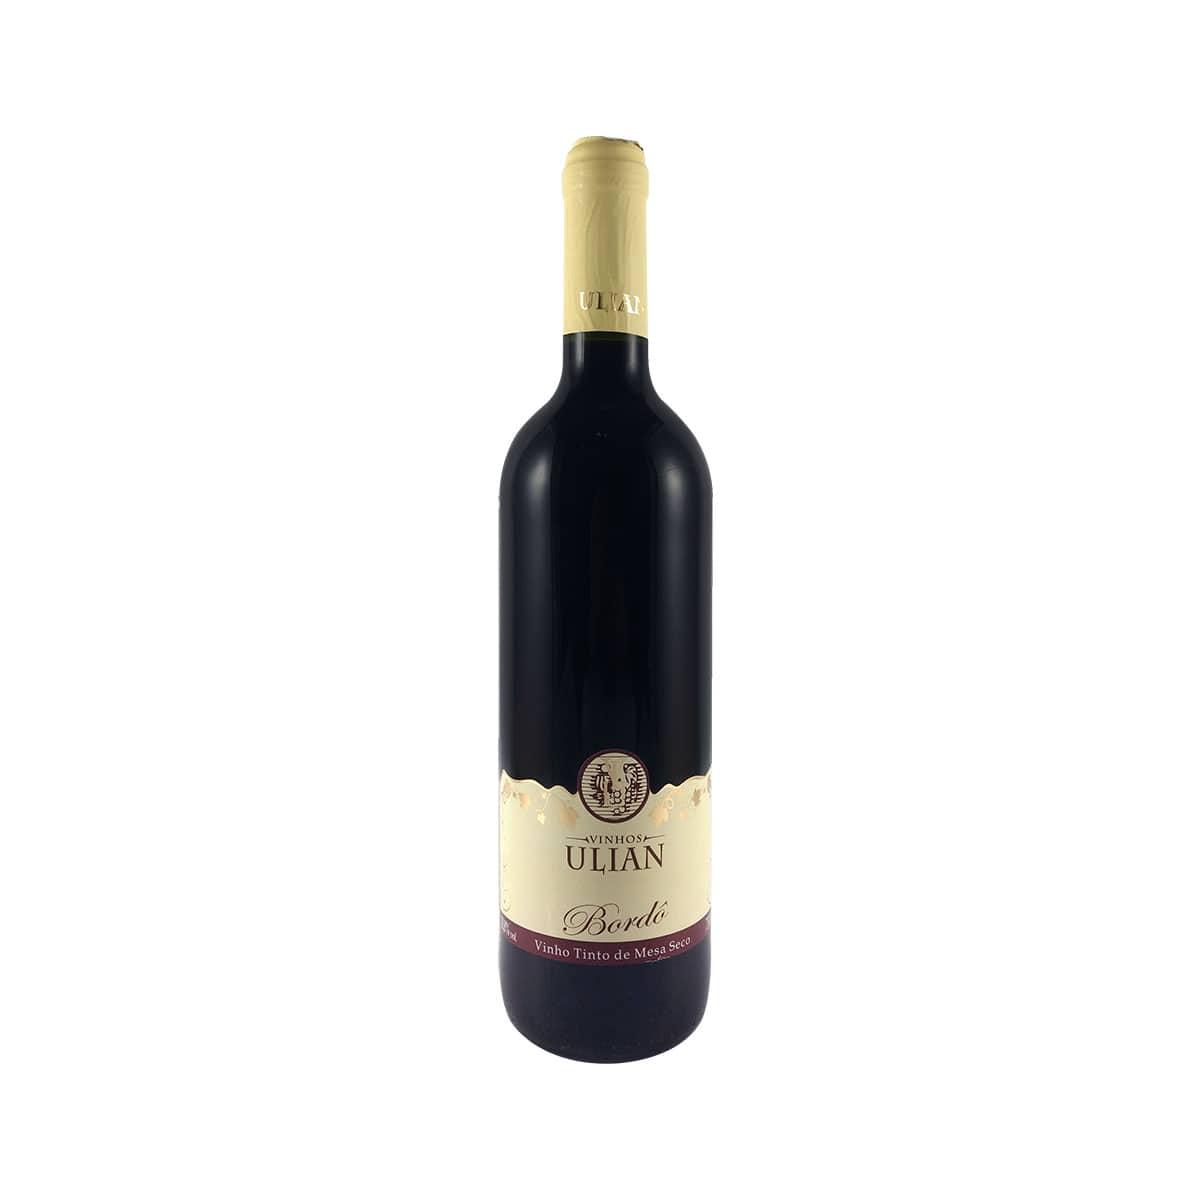 Vinho Tinto Ulian de Mesa Seco Bordô 750ml